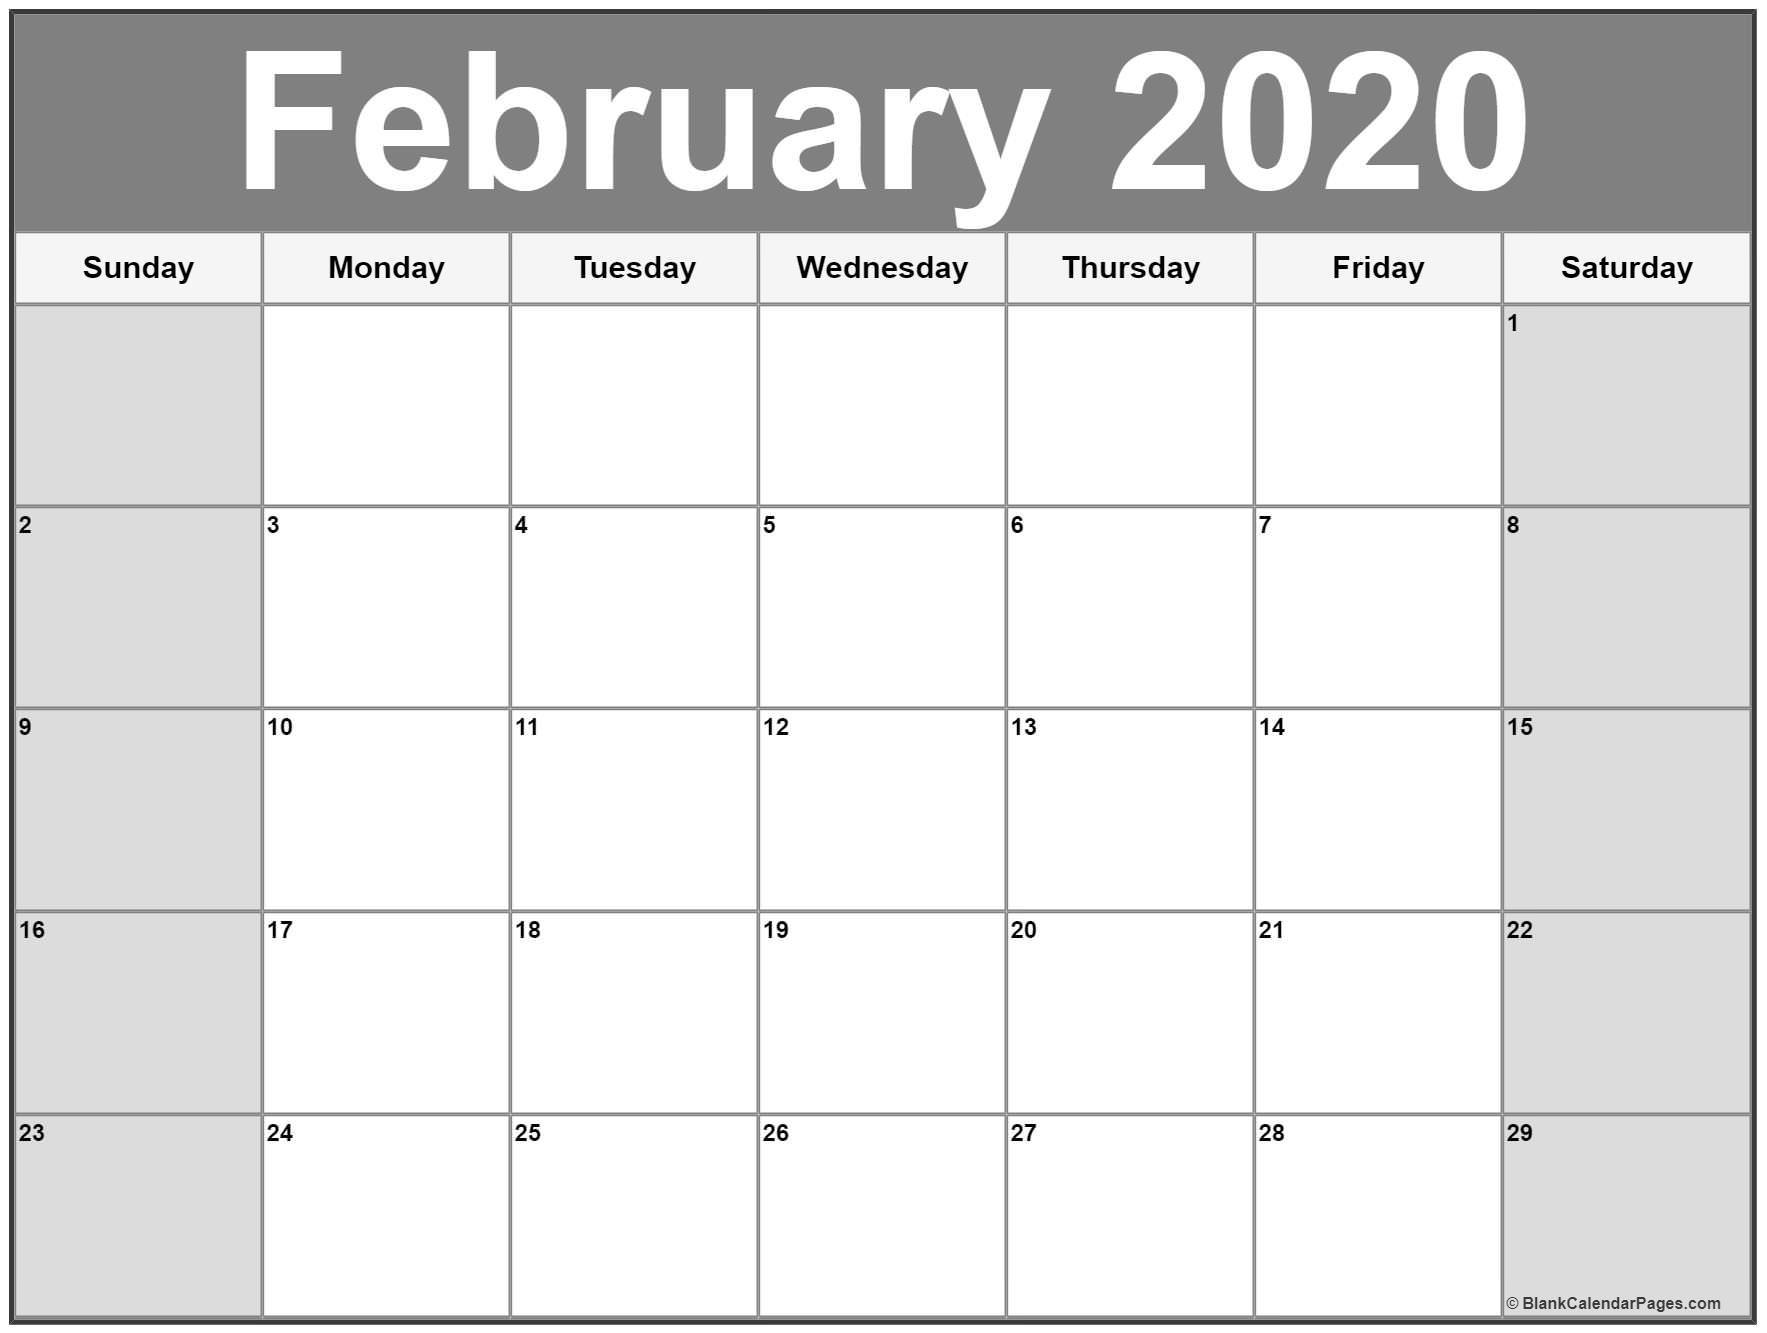 Blank February 2020 Calendar Printable February 2020 Calendar